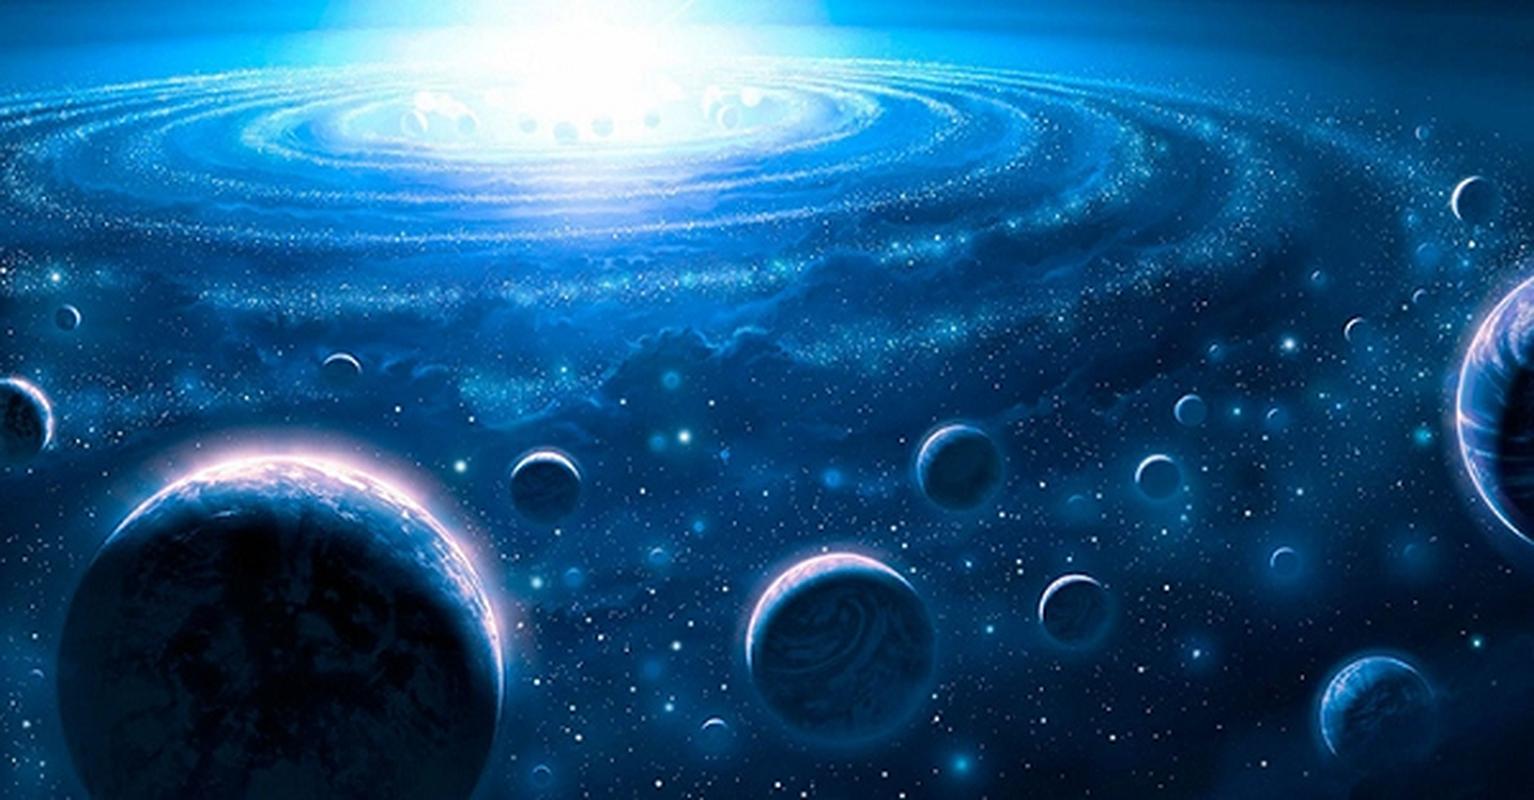 Loi tien tri dang so ve ngay tan the cua thien tai Stephen Hawking-Hinh-12